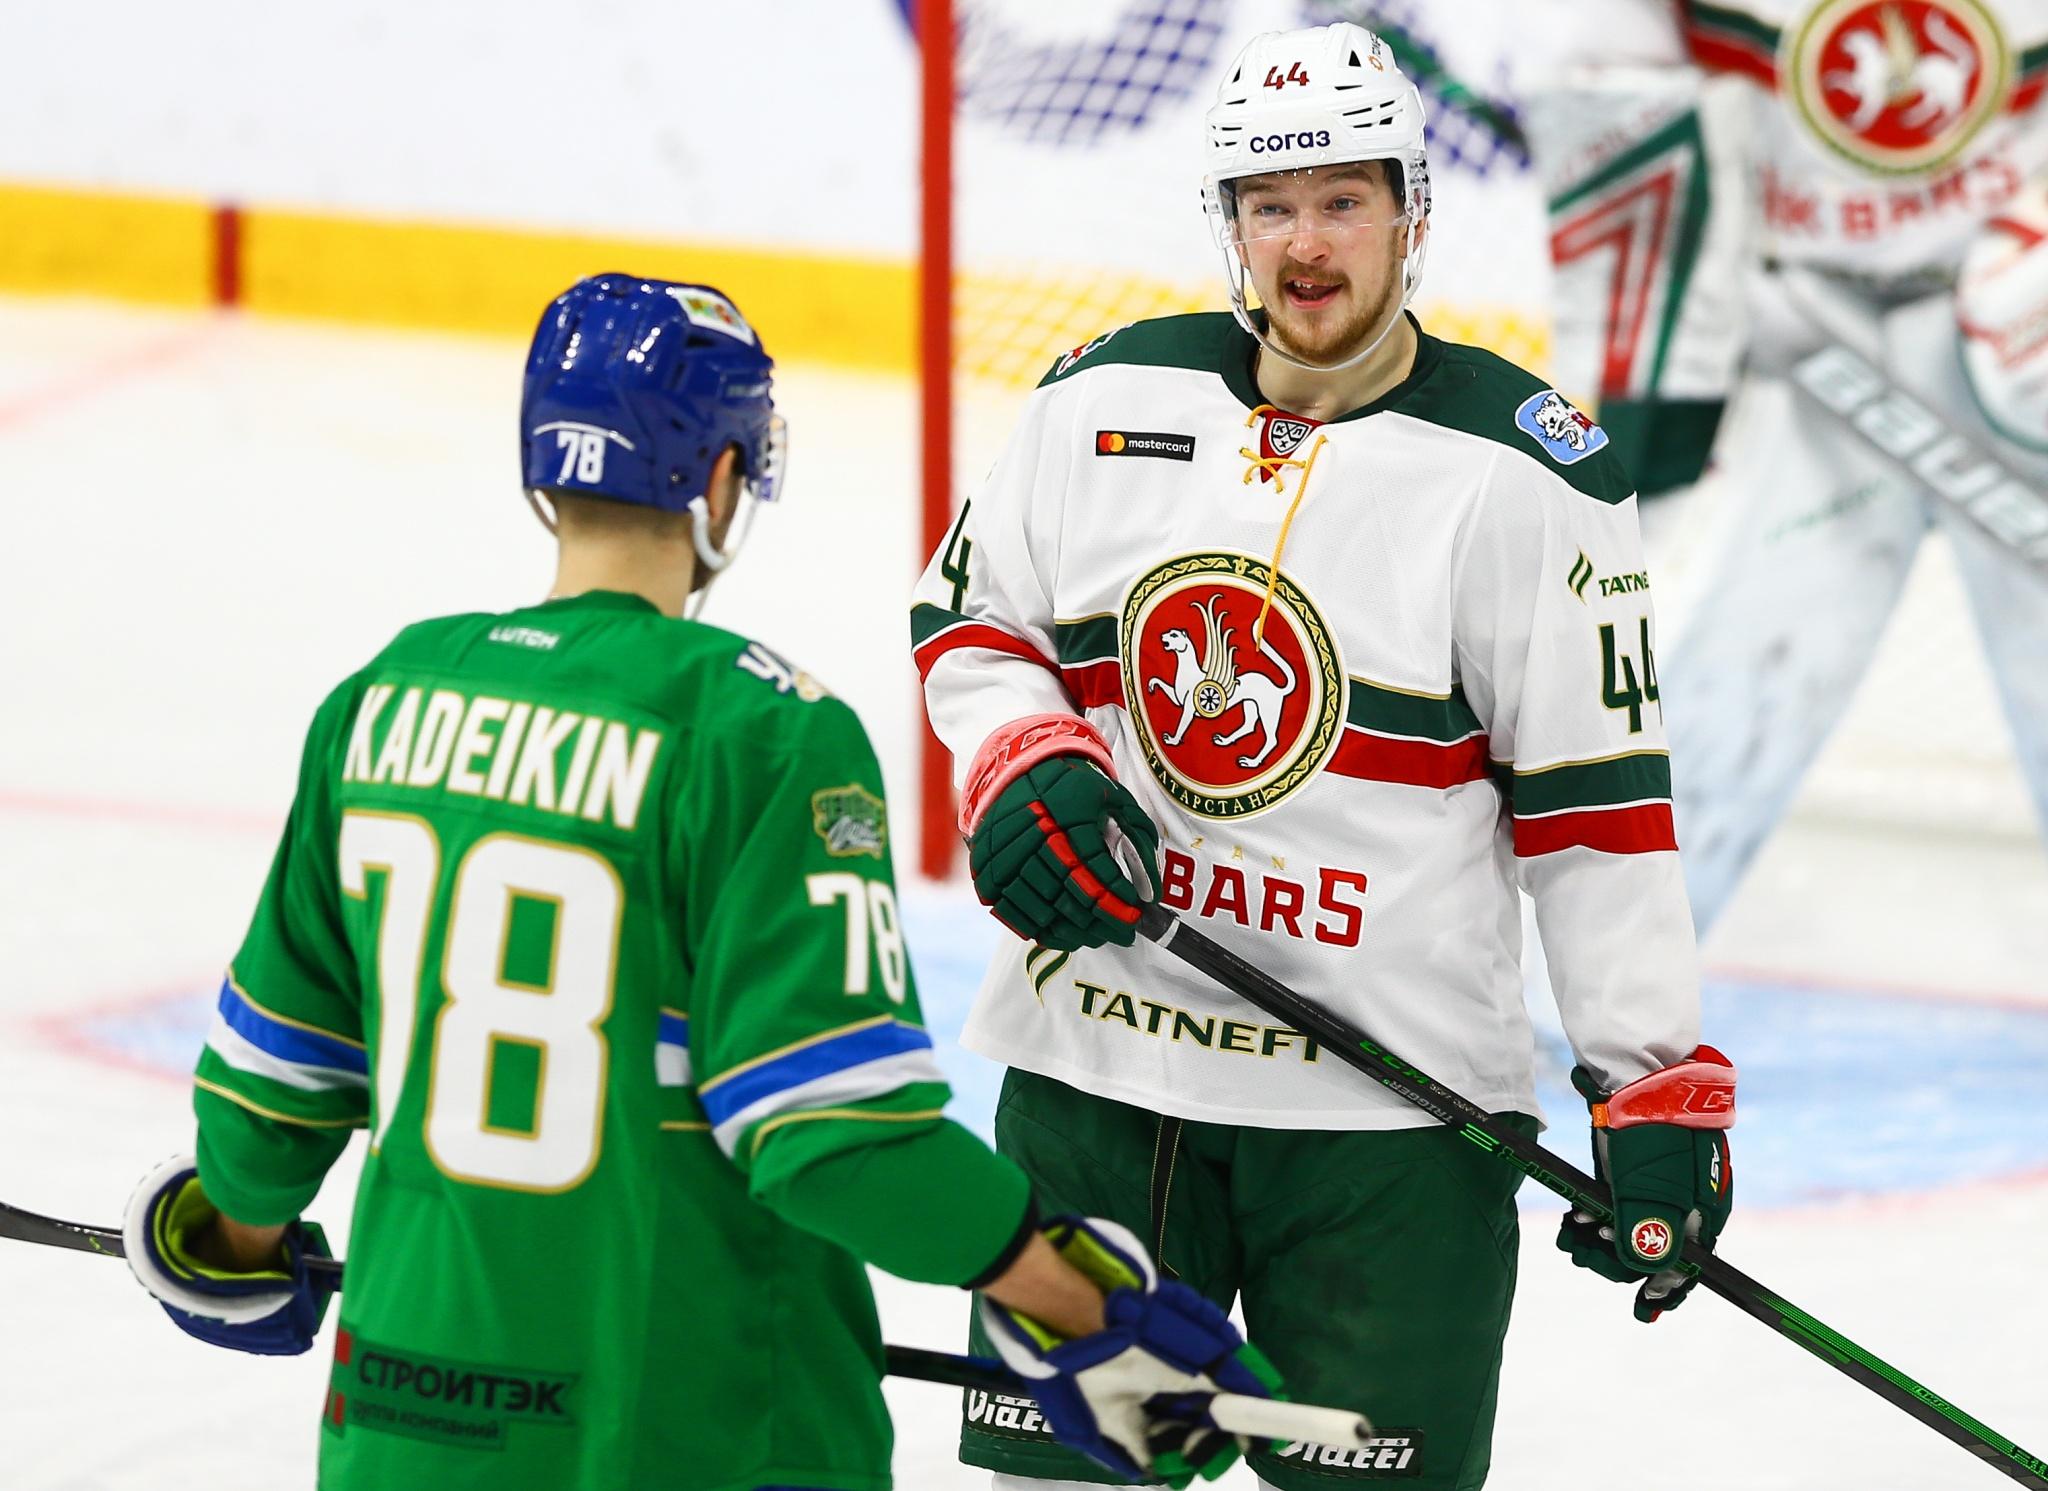 Александр Кадейкин и Дмитрий Юдин. Фото: Светлана Садыкова